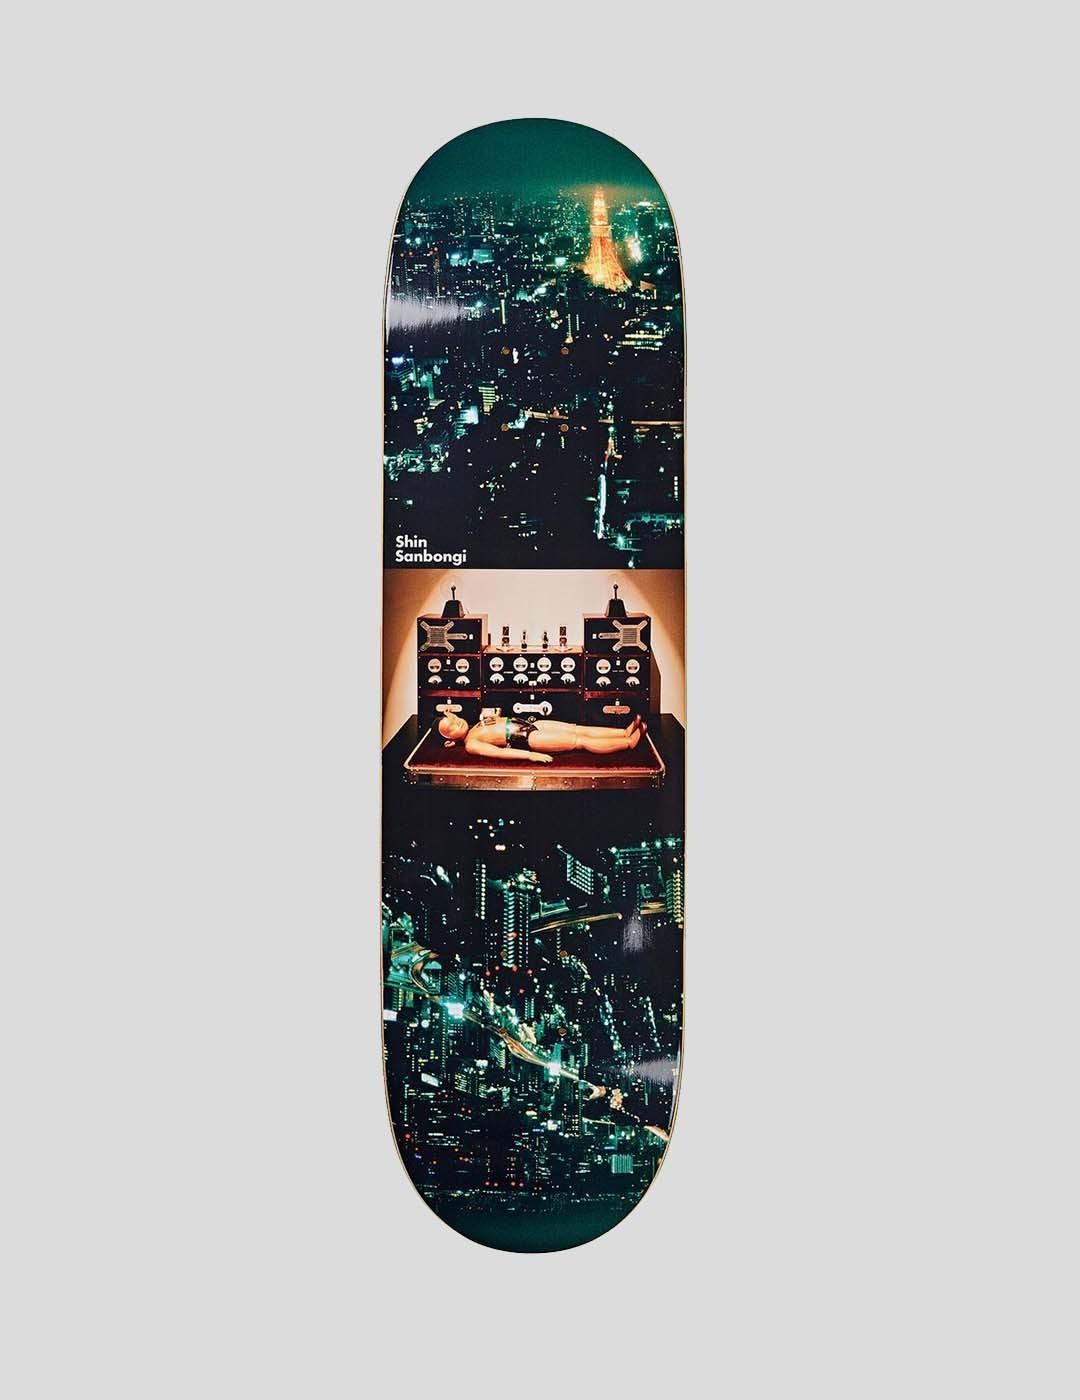 TABLA POLAR SKATE CO SHIN SANBONGI - ASTRO BOY 8.0 DECK